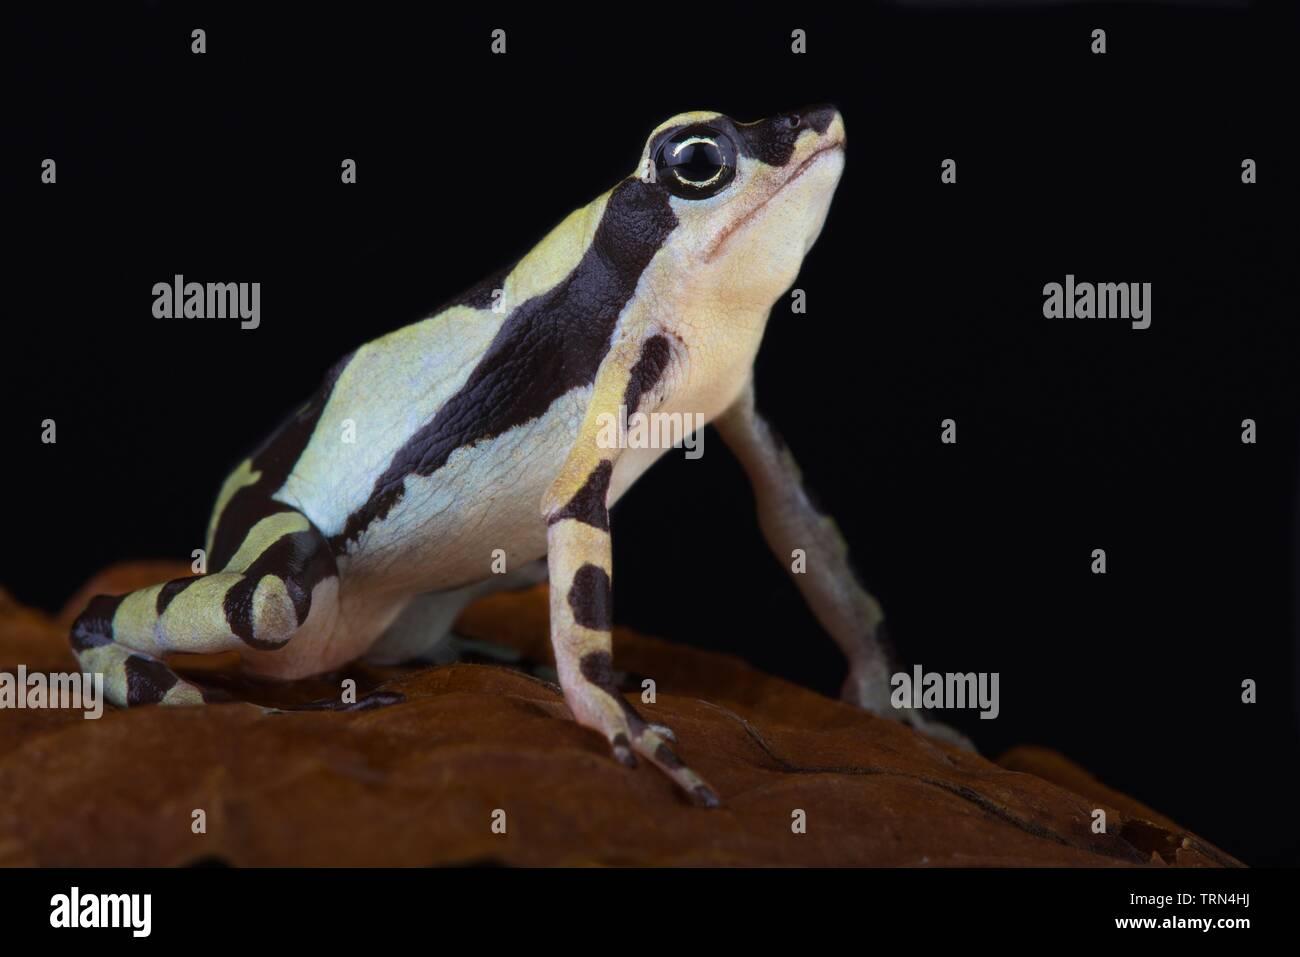 Stumpfoot toad (Atelopus hoogmoedi) - Stock Image